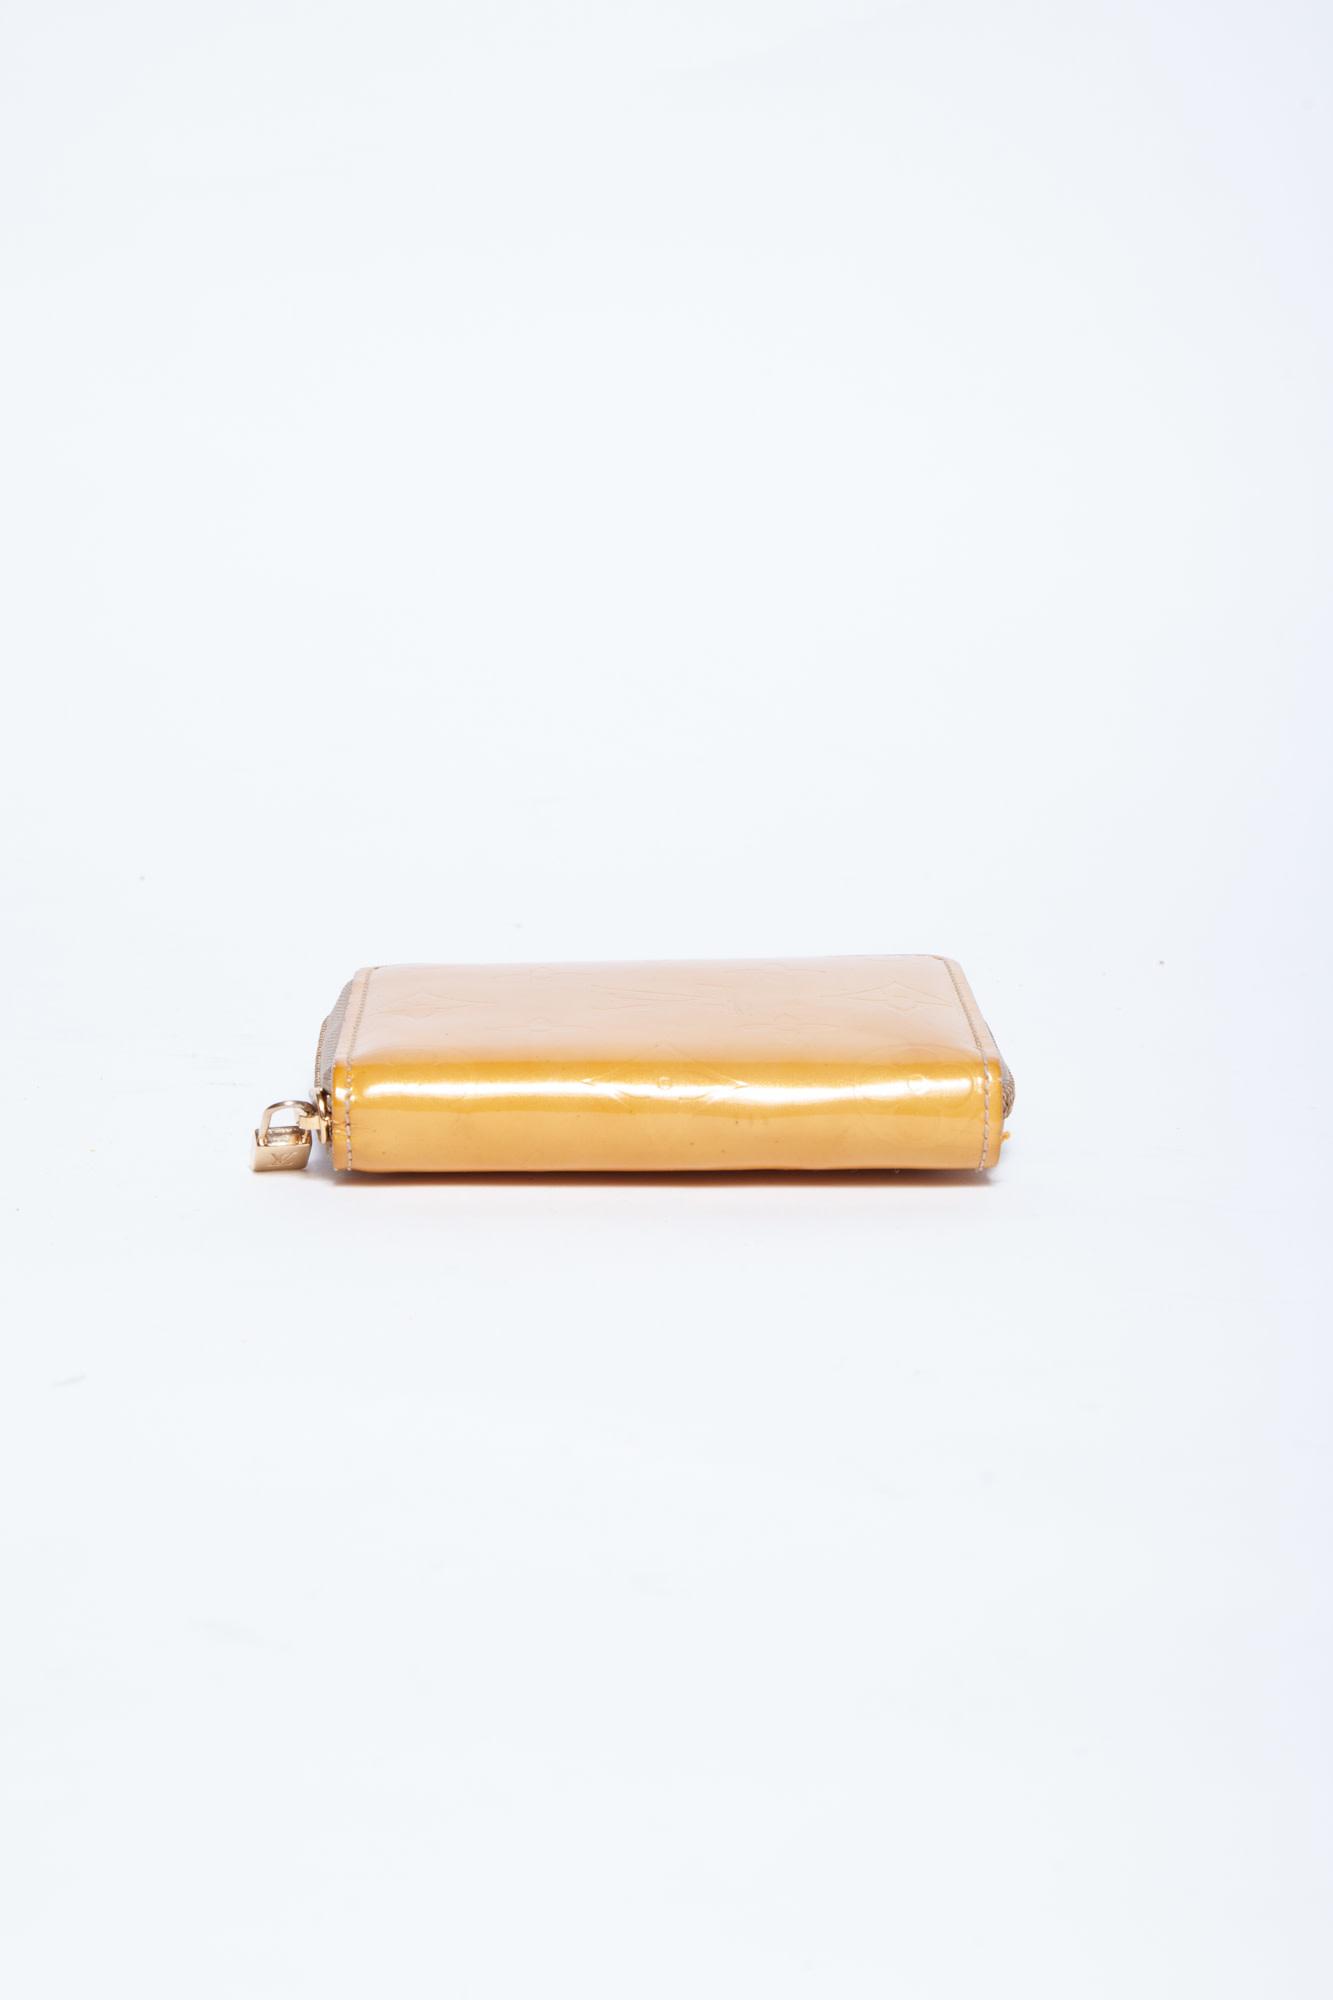 Louis Vuitton YELLOW VERNIS BROOME MONOGRAM WALLET